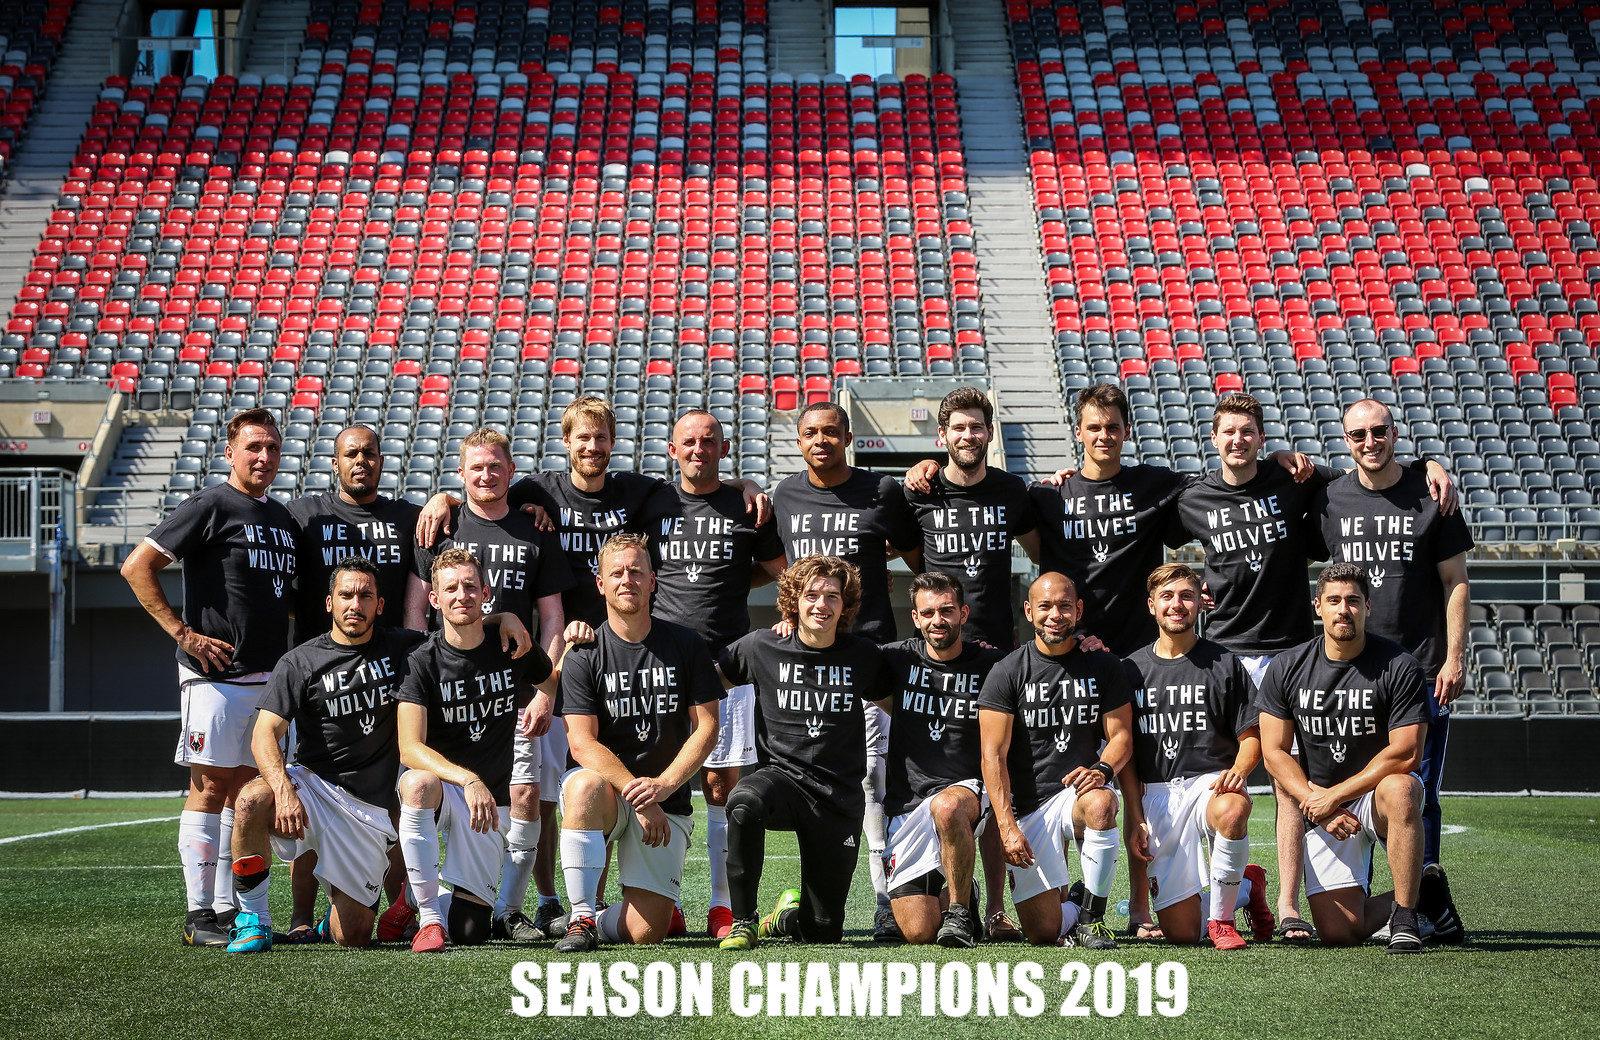 Champions not forgotten.